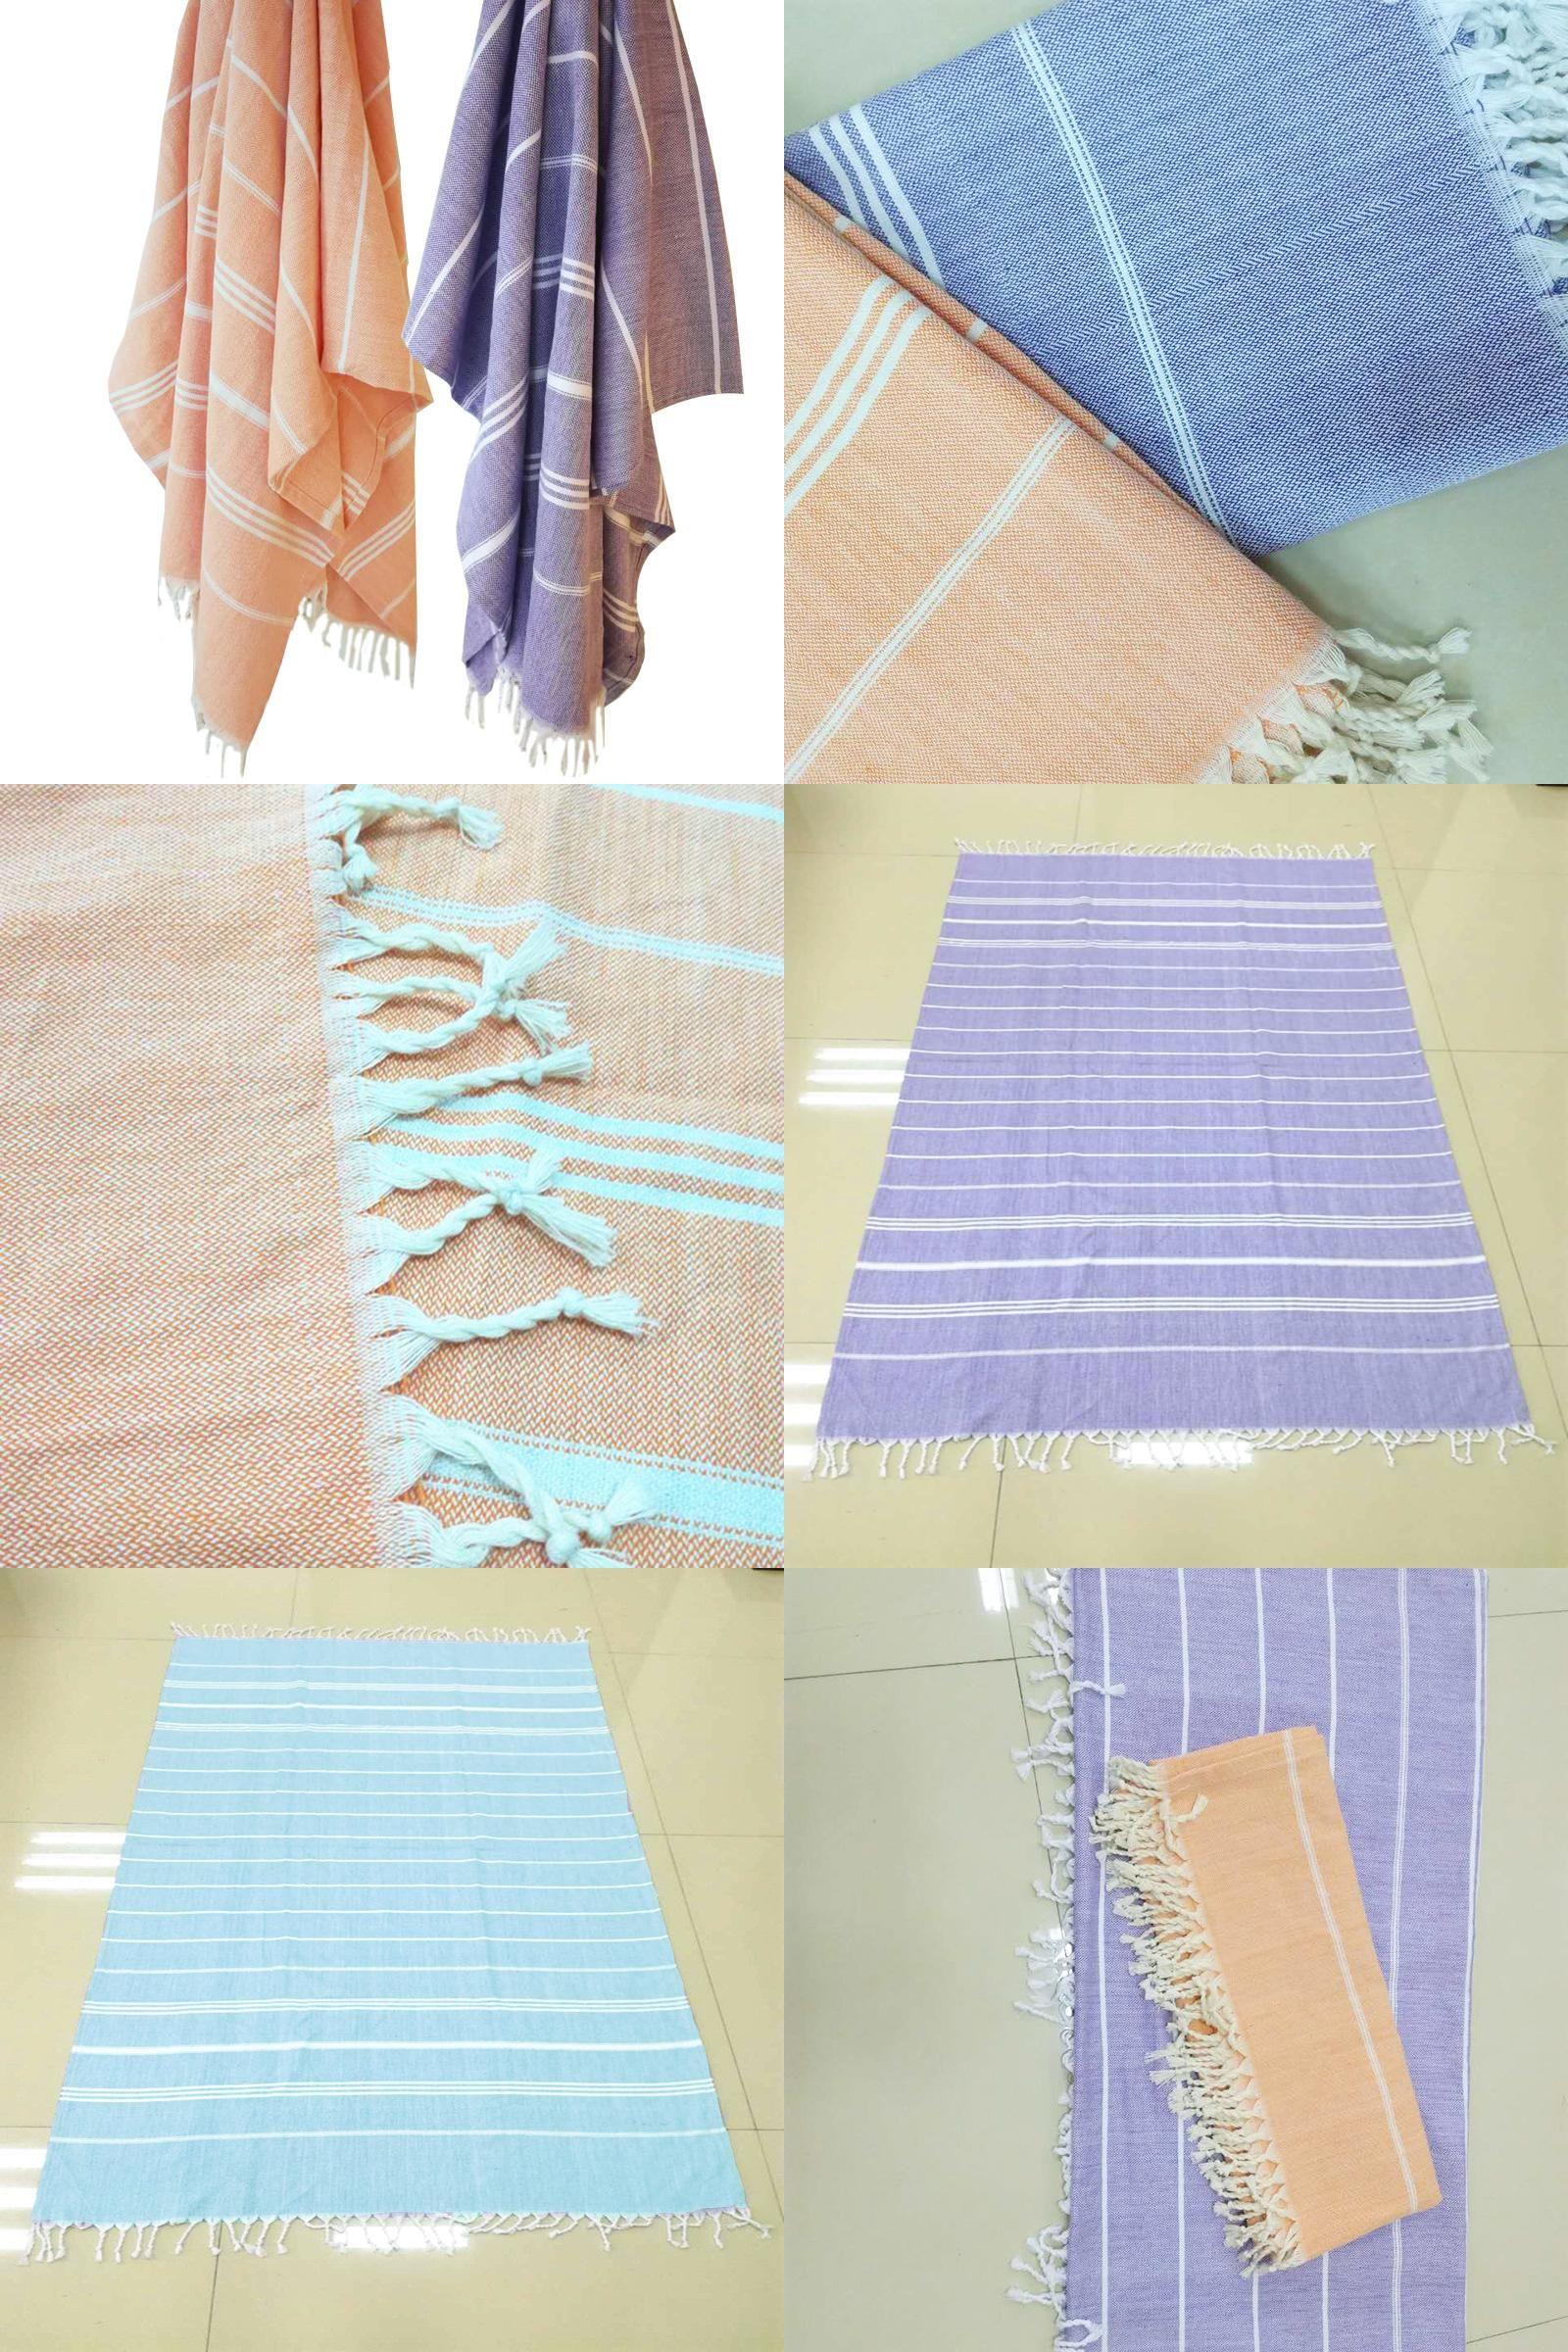 Visit To Buy Cotton Linen Beach Bath Towels Striped Beach Towel